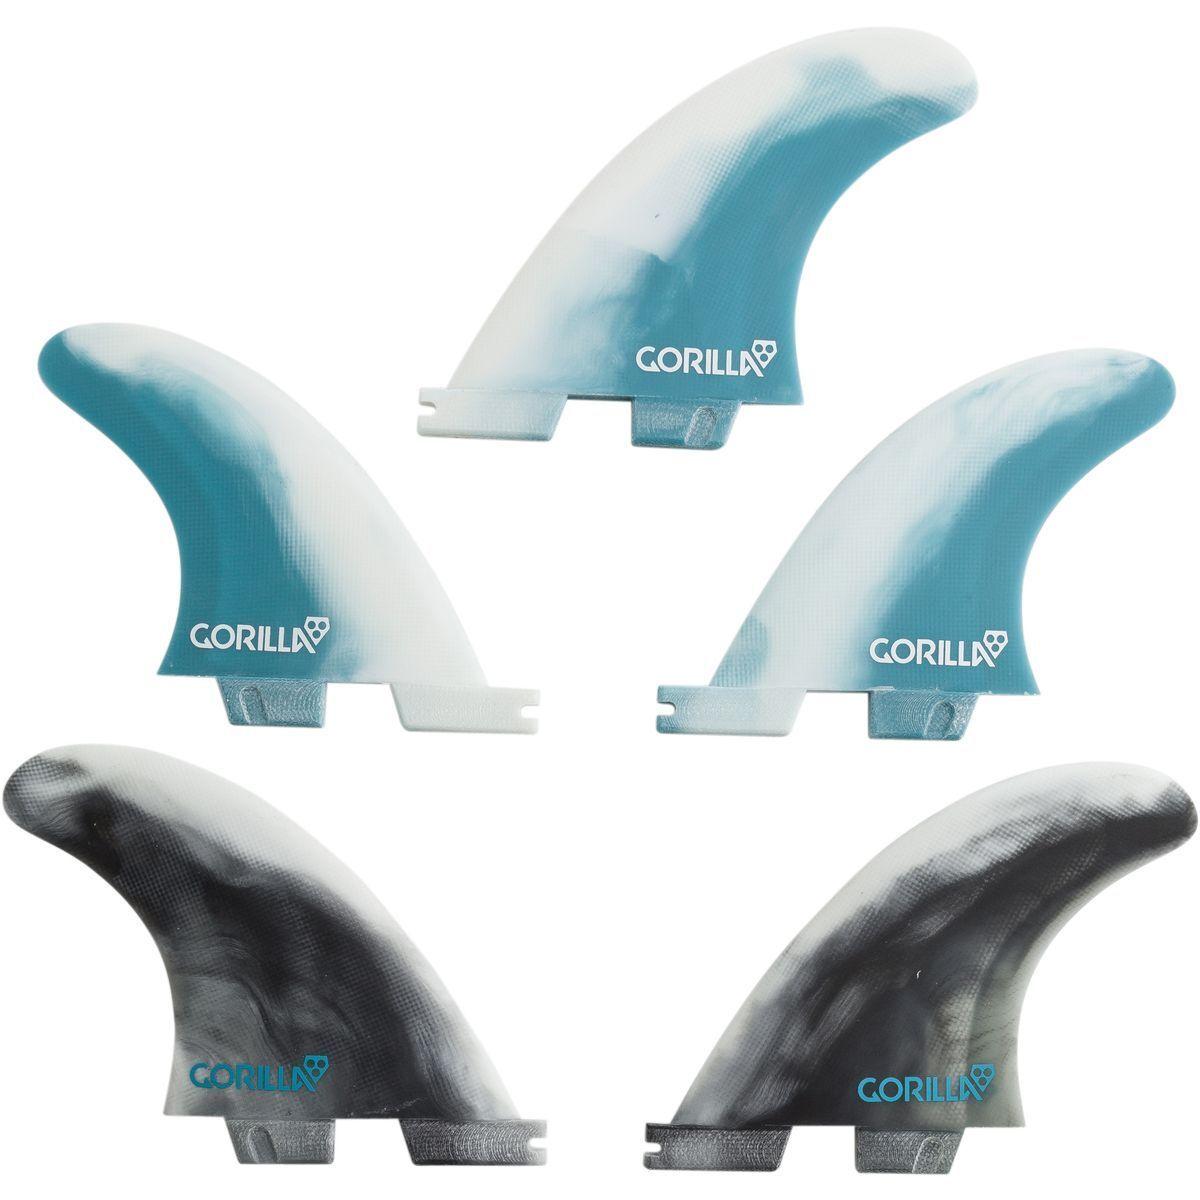 FCS 2 Gorilla Core Tri - Quad Medium Fin Set (5 Fins) Thruster or Quad Surfboard